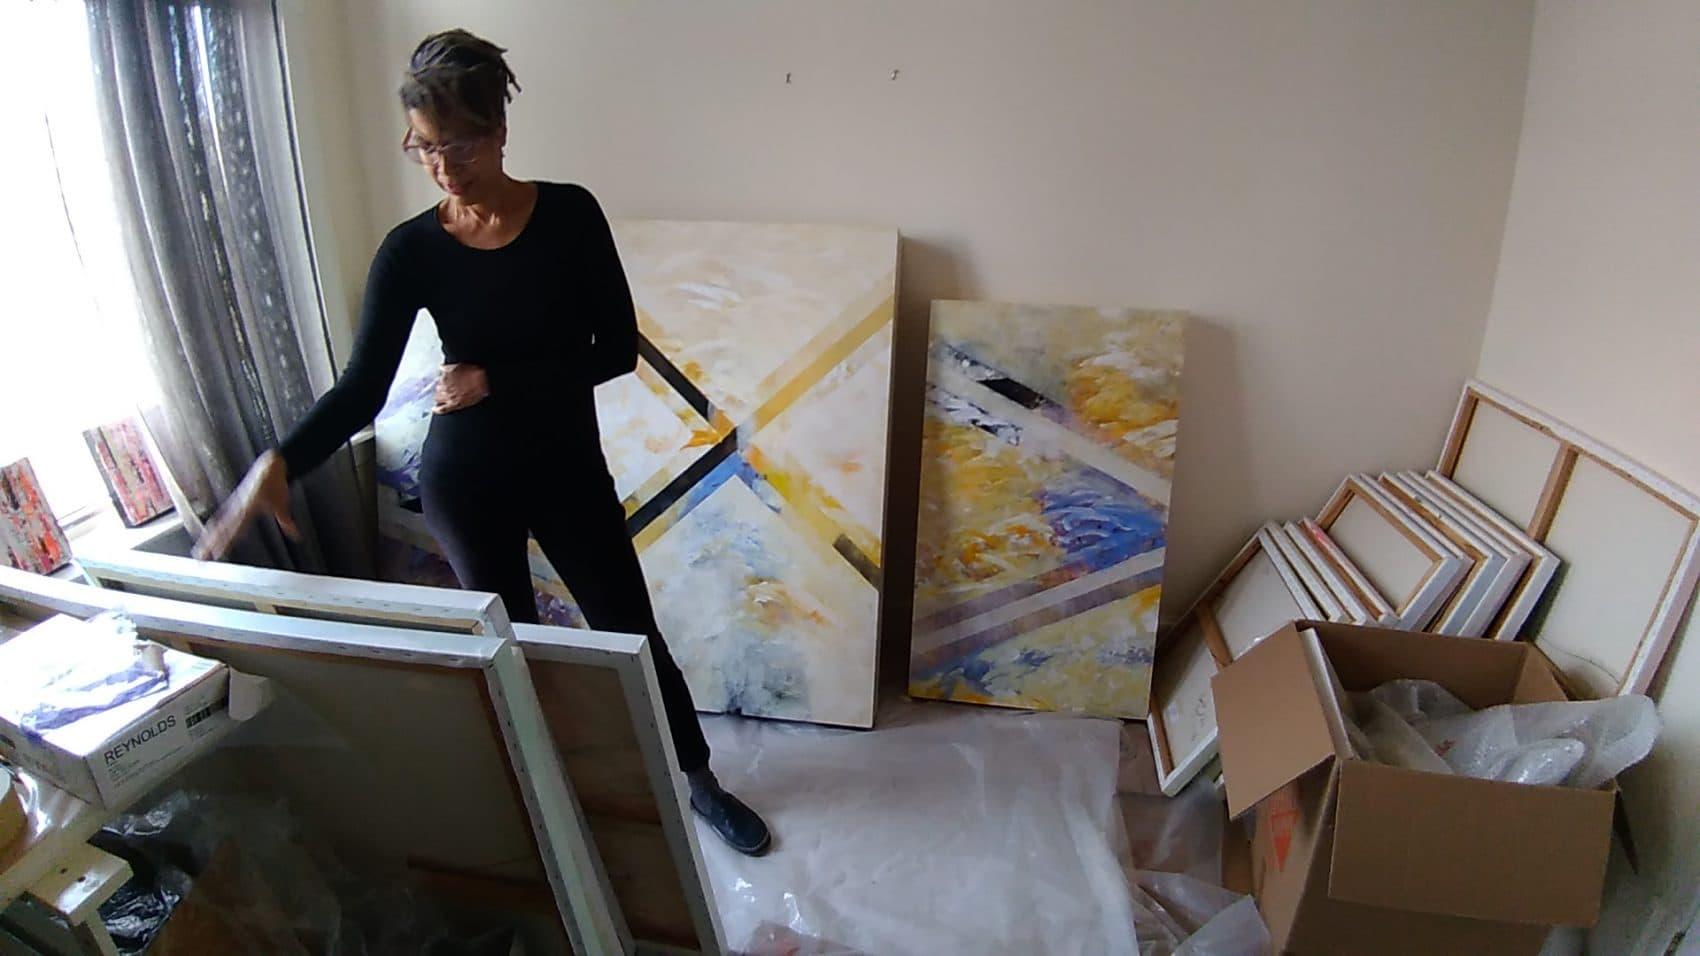 Artist Pamela Reynolds sorts through her paintings. (Courtesy)